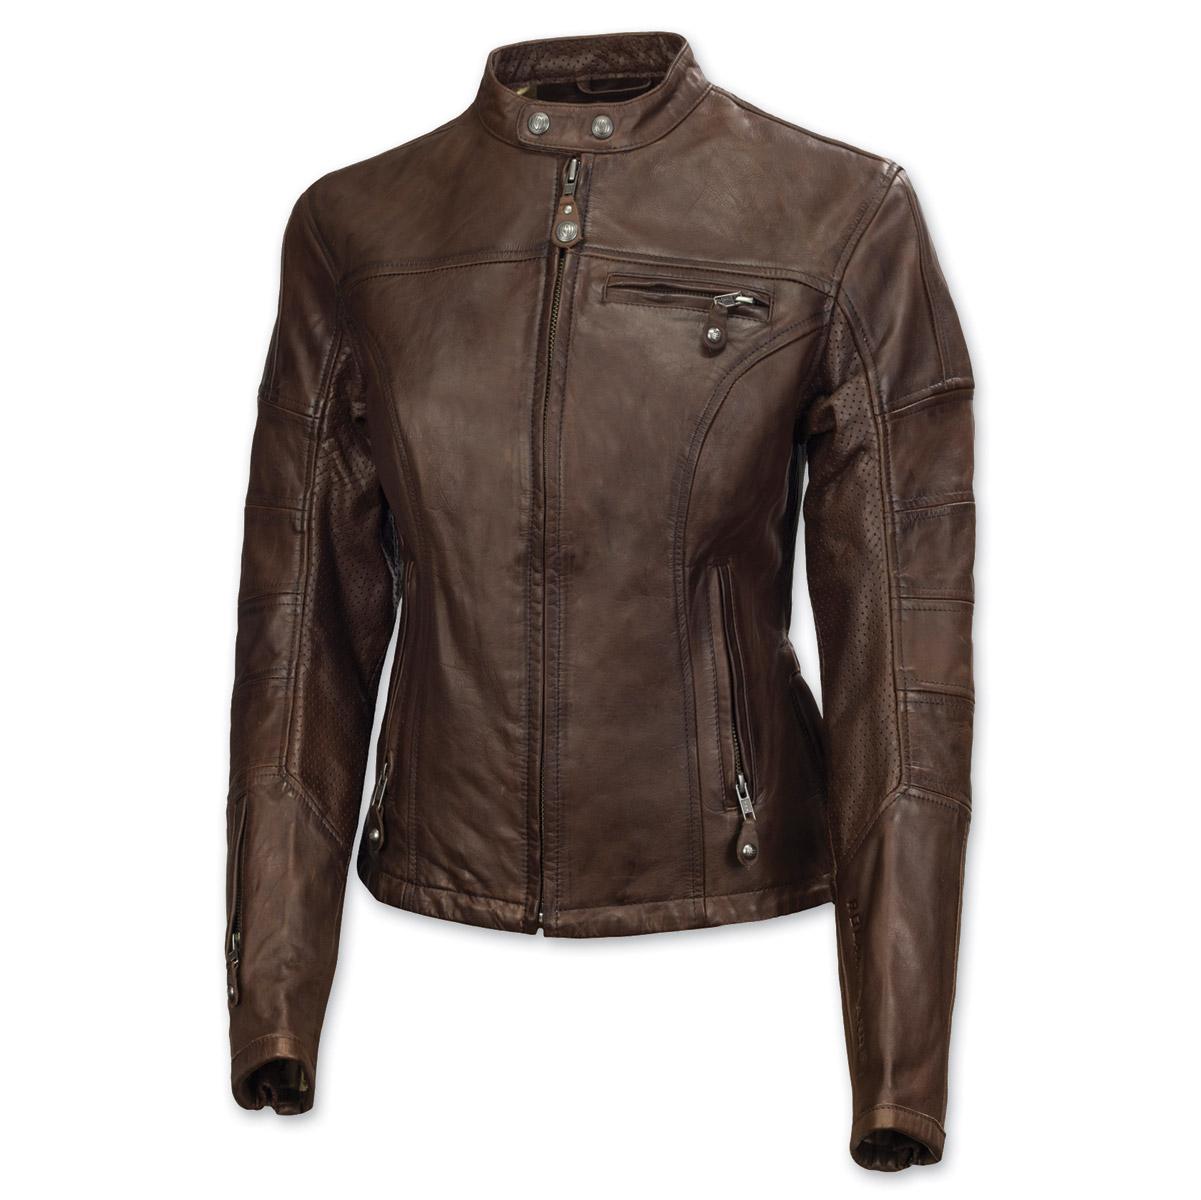 Roland Sands Design Maven Women's Tobacco Brown Leather Jacket